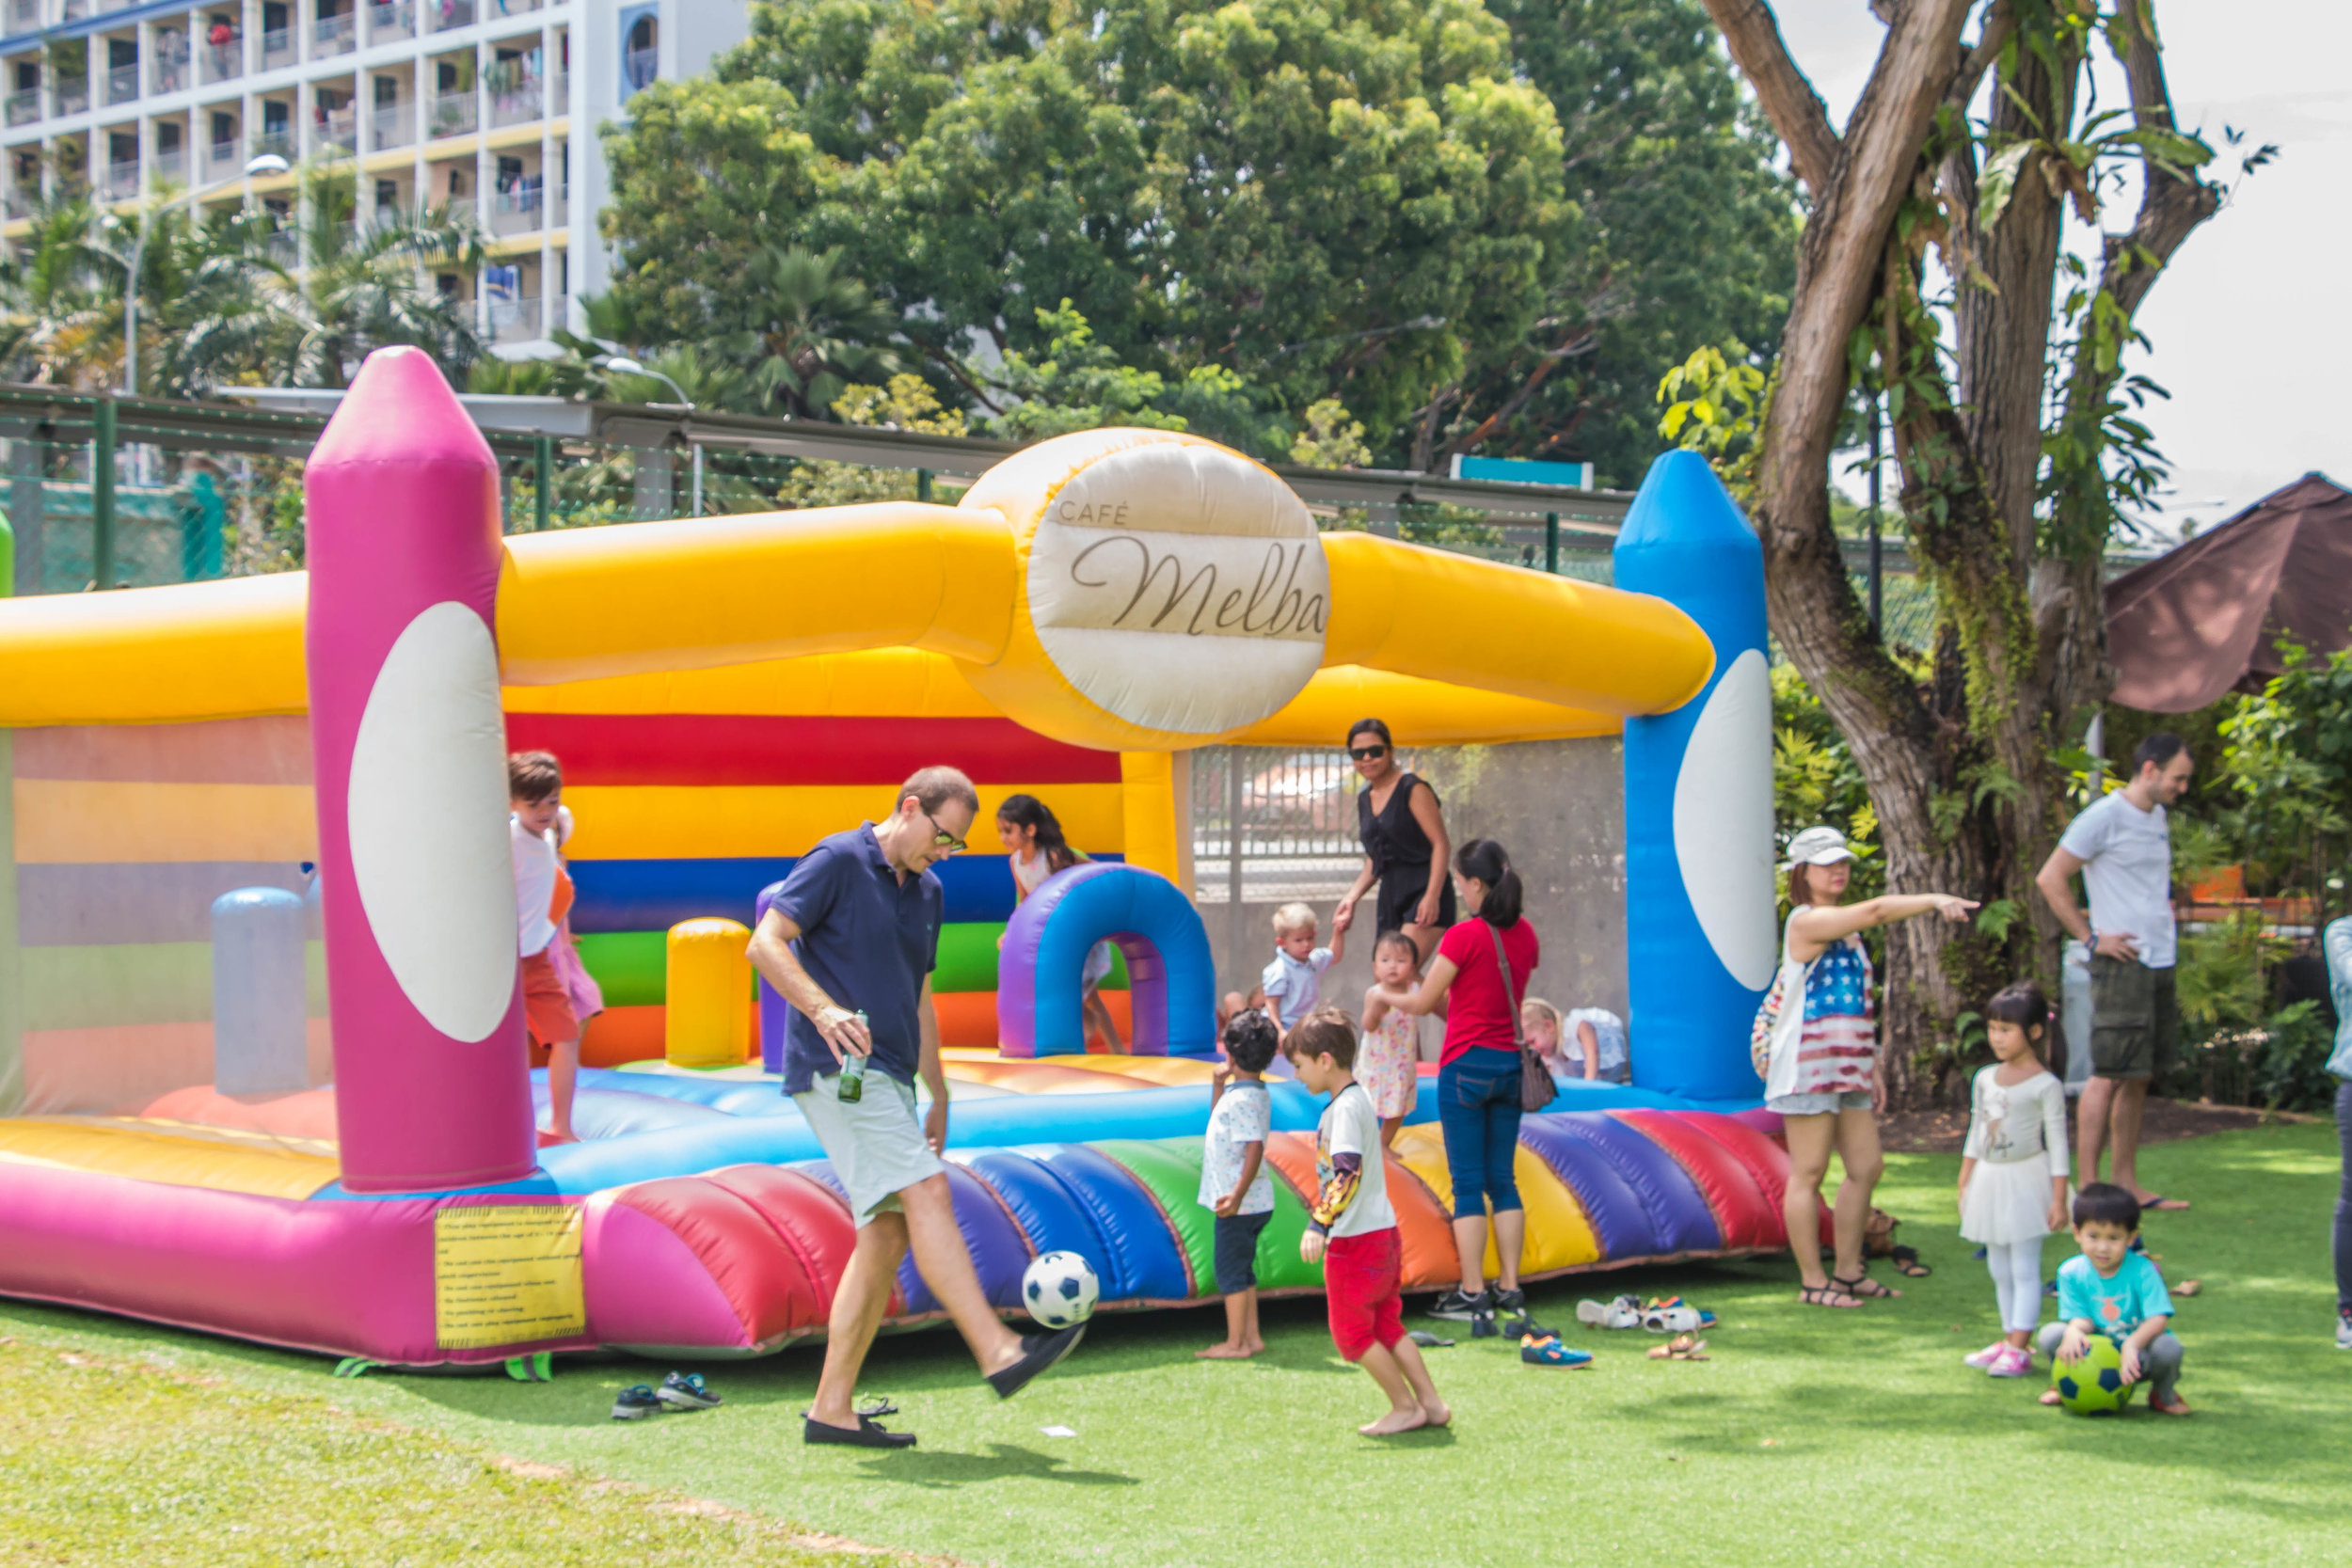 Bouncy castle at Cafe Melba Goodman Arts Centre